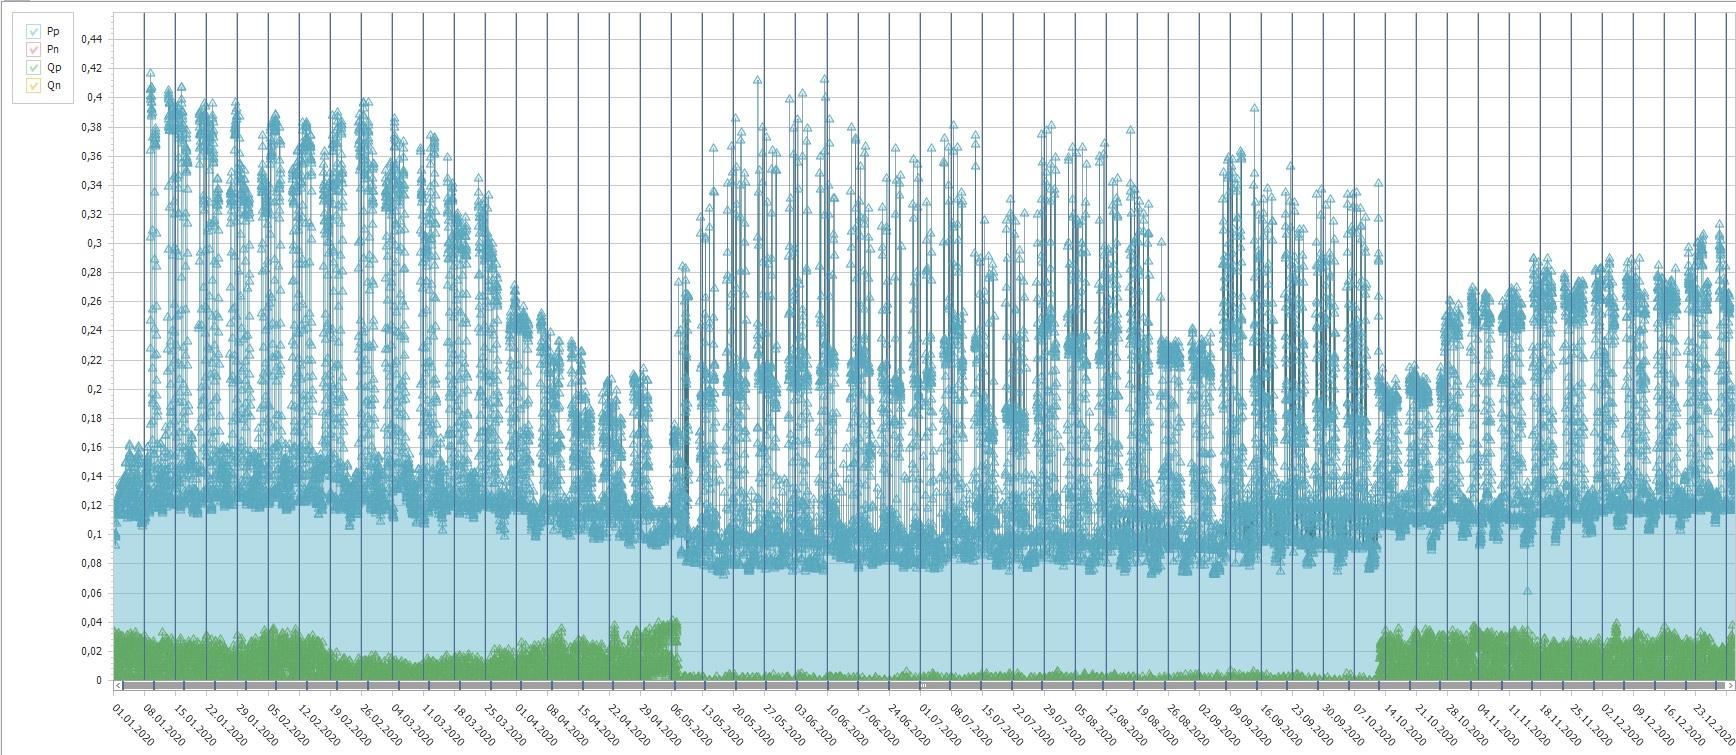 Рис. №5. График потребления электричества бизнес-центром. Чётко видно начало пандемии COVID-19 и удалёнку.